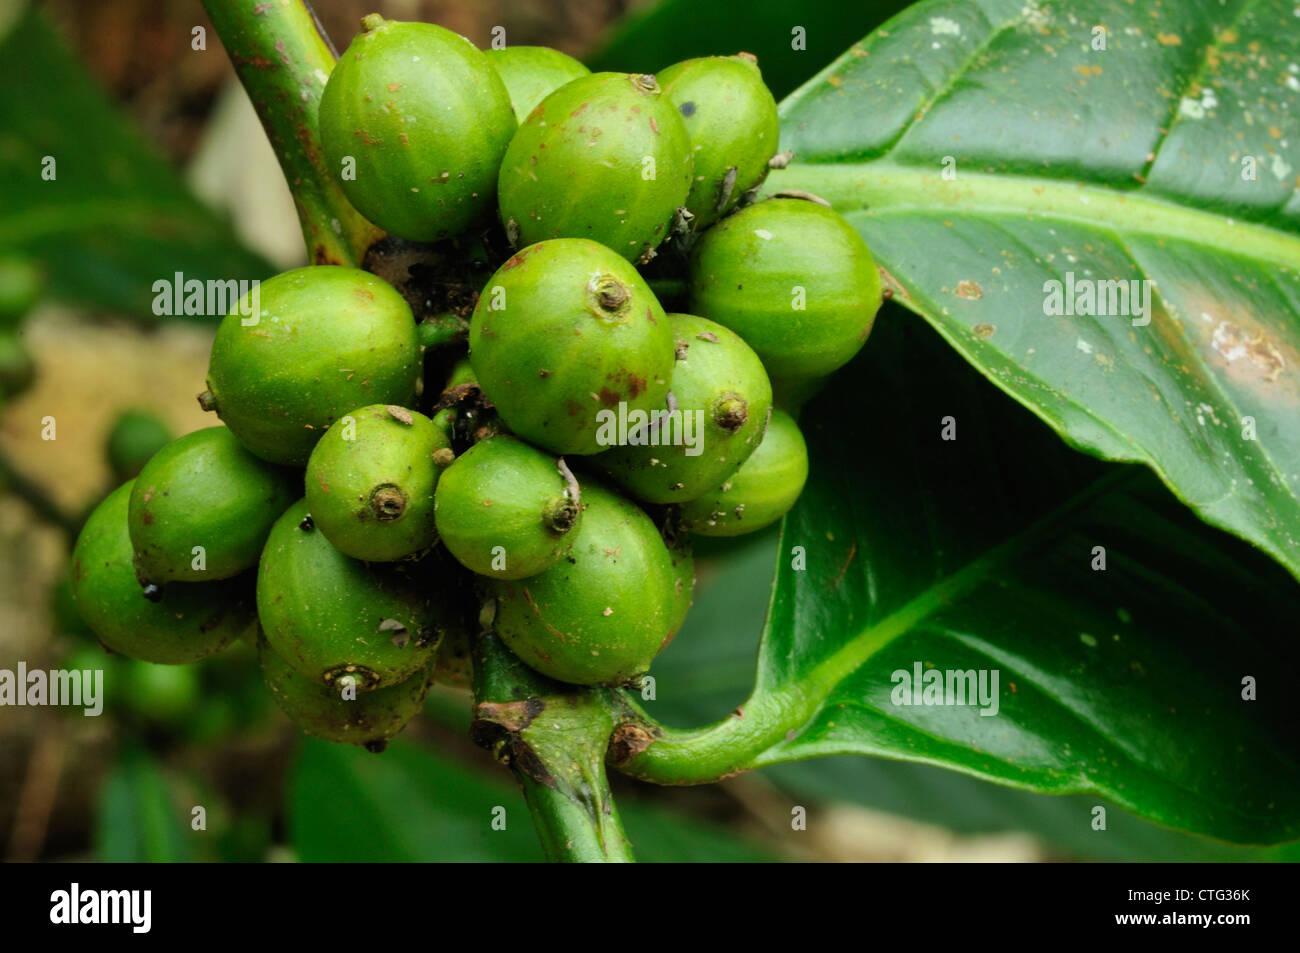 Coffea arabica fruits, Rubiaceae, coffeee, Bali forest, Indonesia, Asia - Stock Image